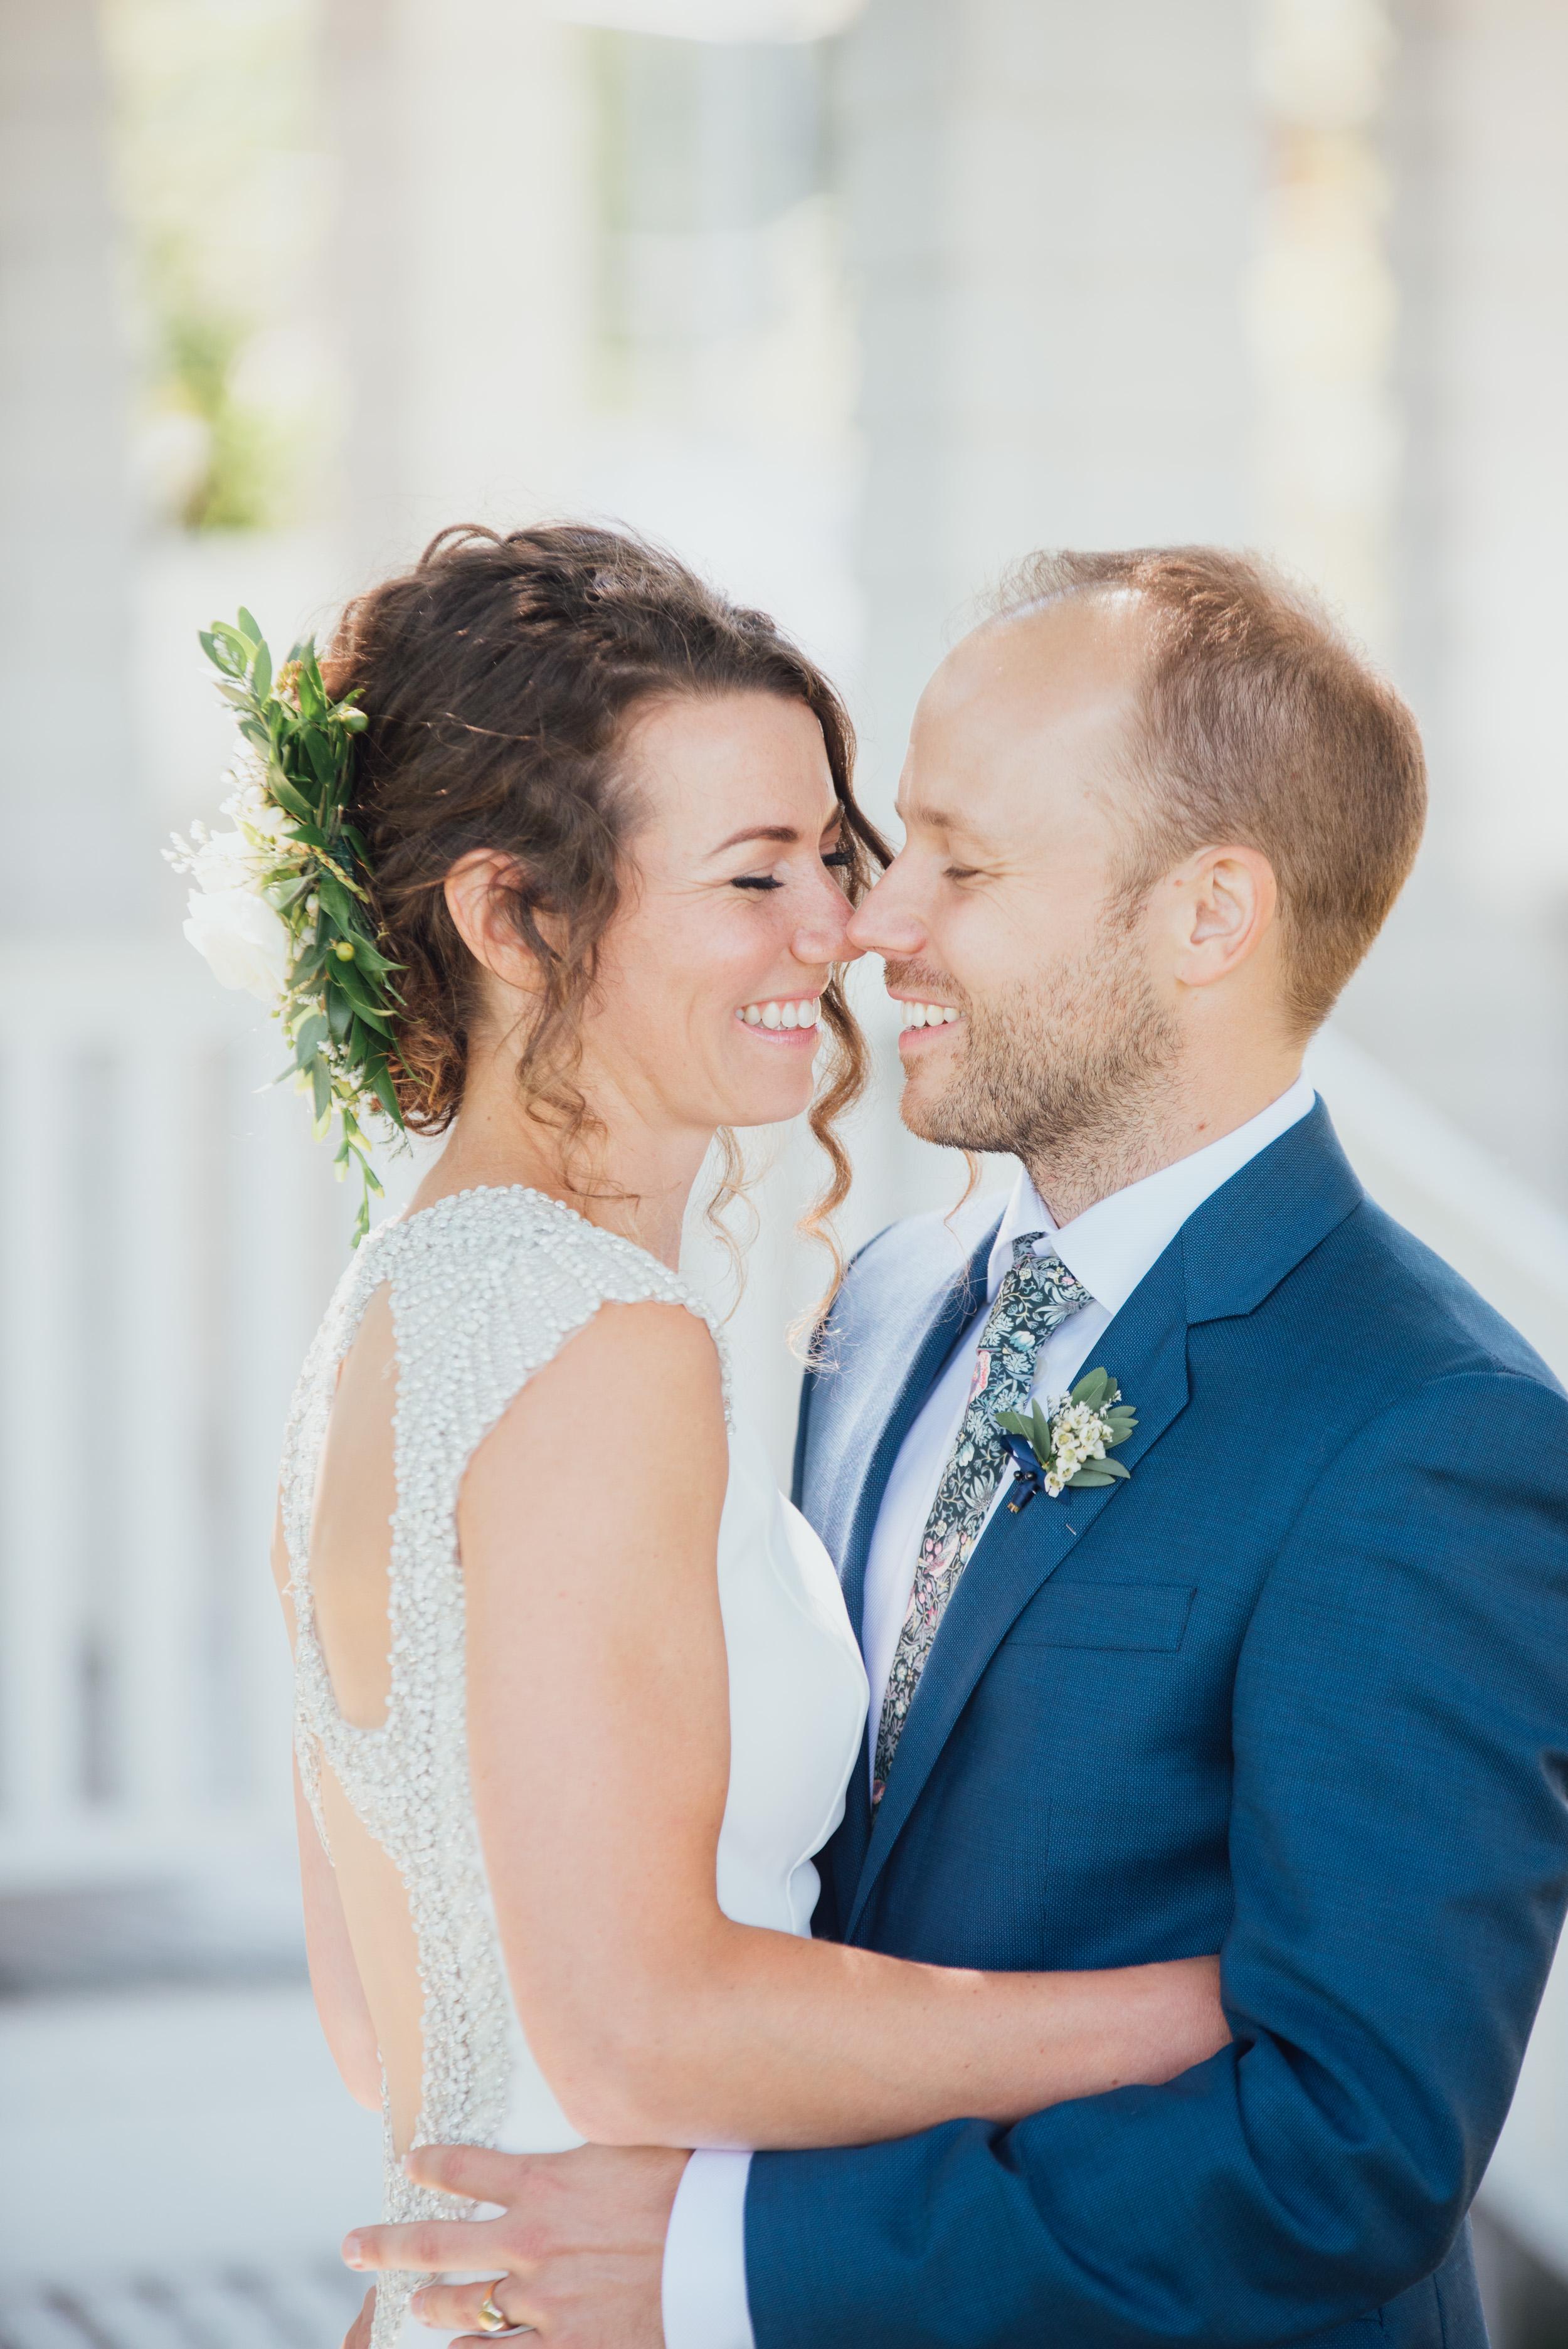 cleland-studios-wedding-photography-42.jpg